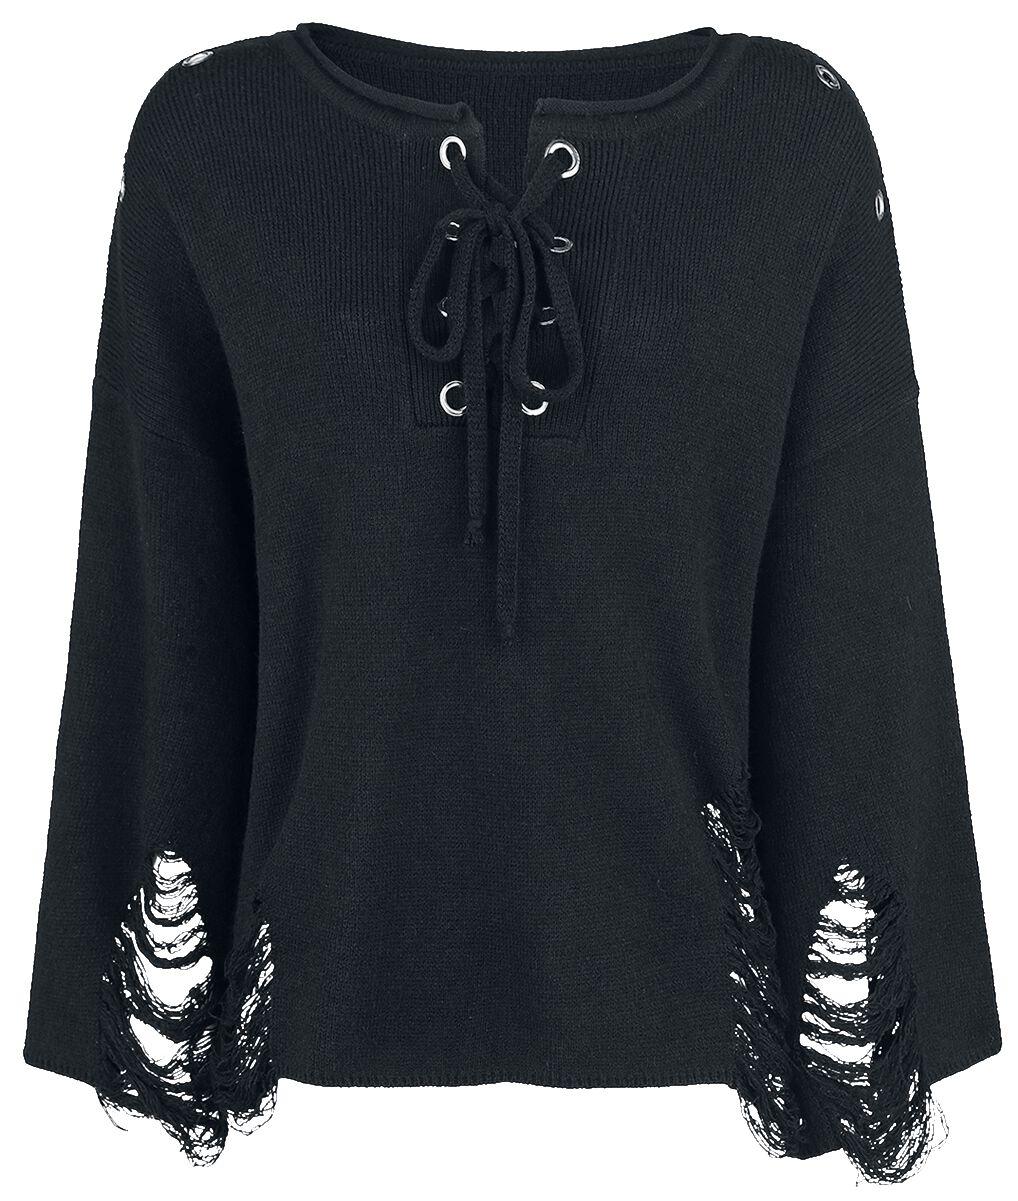 Marki - Bluzy - Sweter damski Jawbreaker Black Distresses Knit Sweter damski czarny - 358708